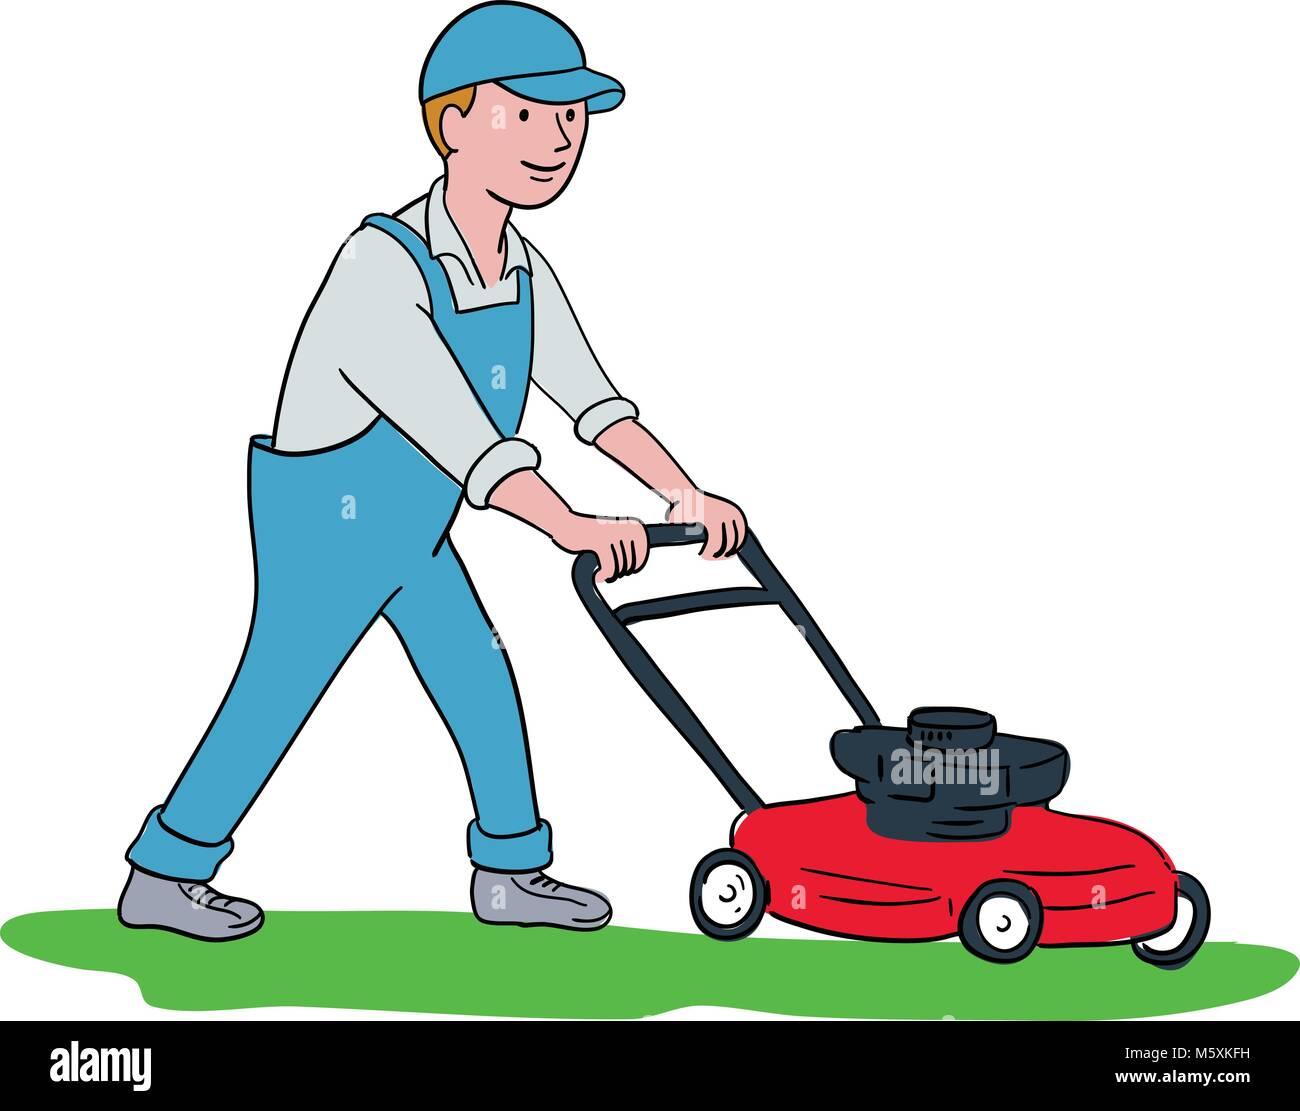 Cartoon Man On Mower : Lawn mower man gardener cartoon stock photos